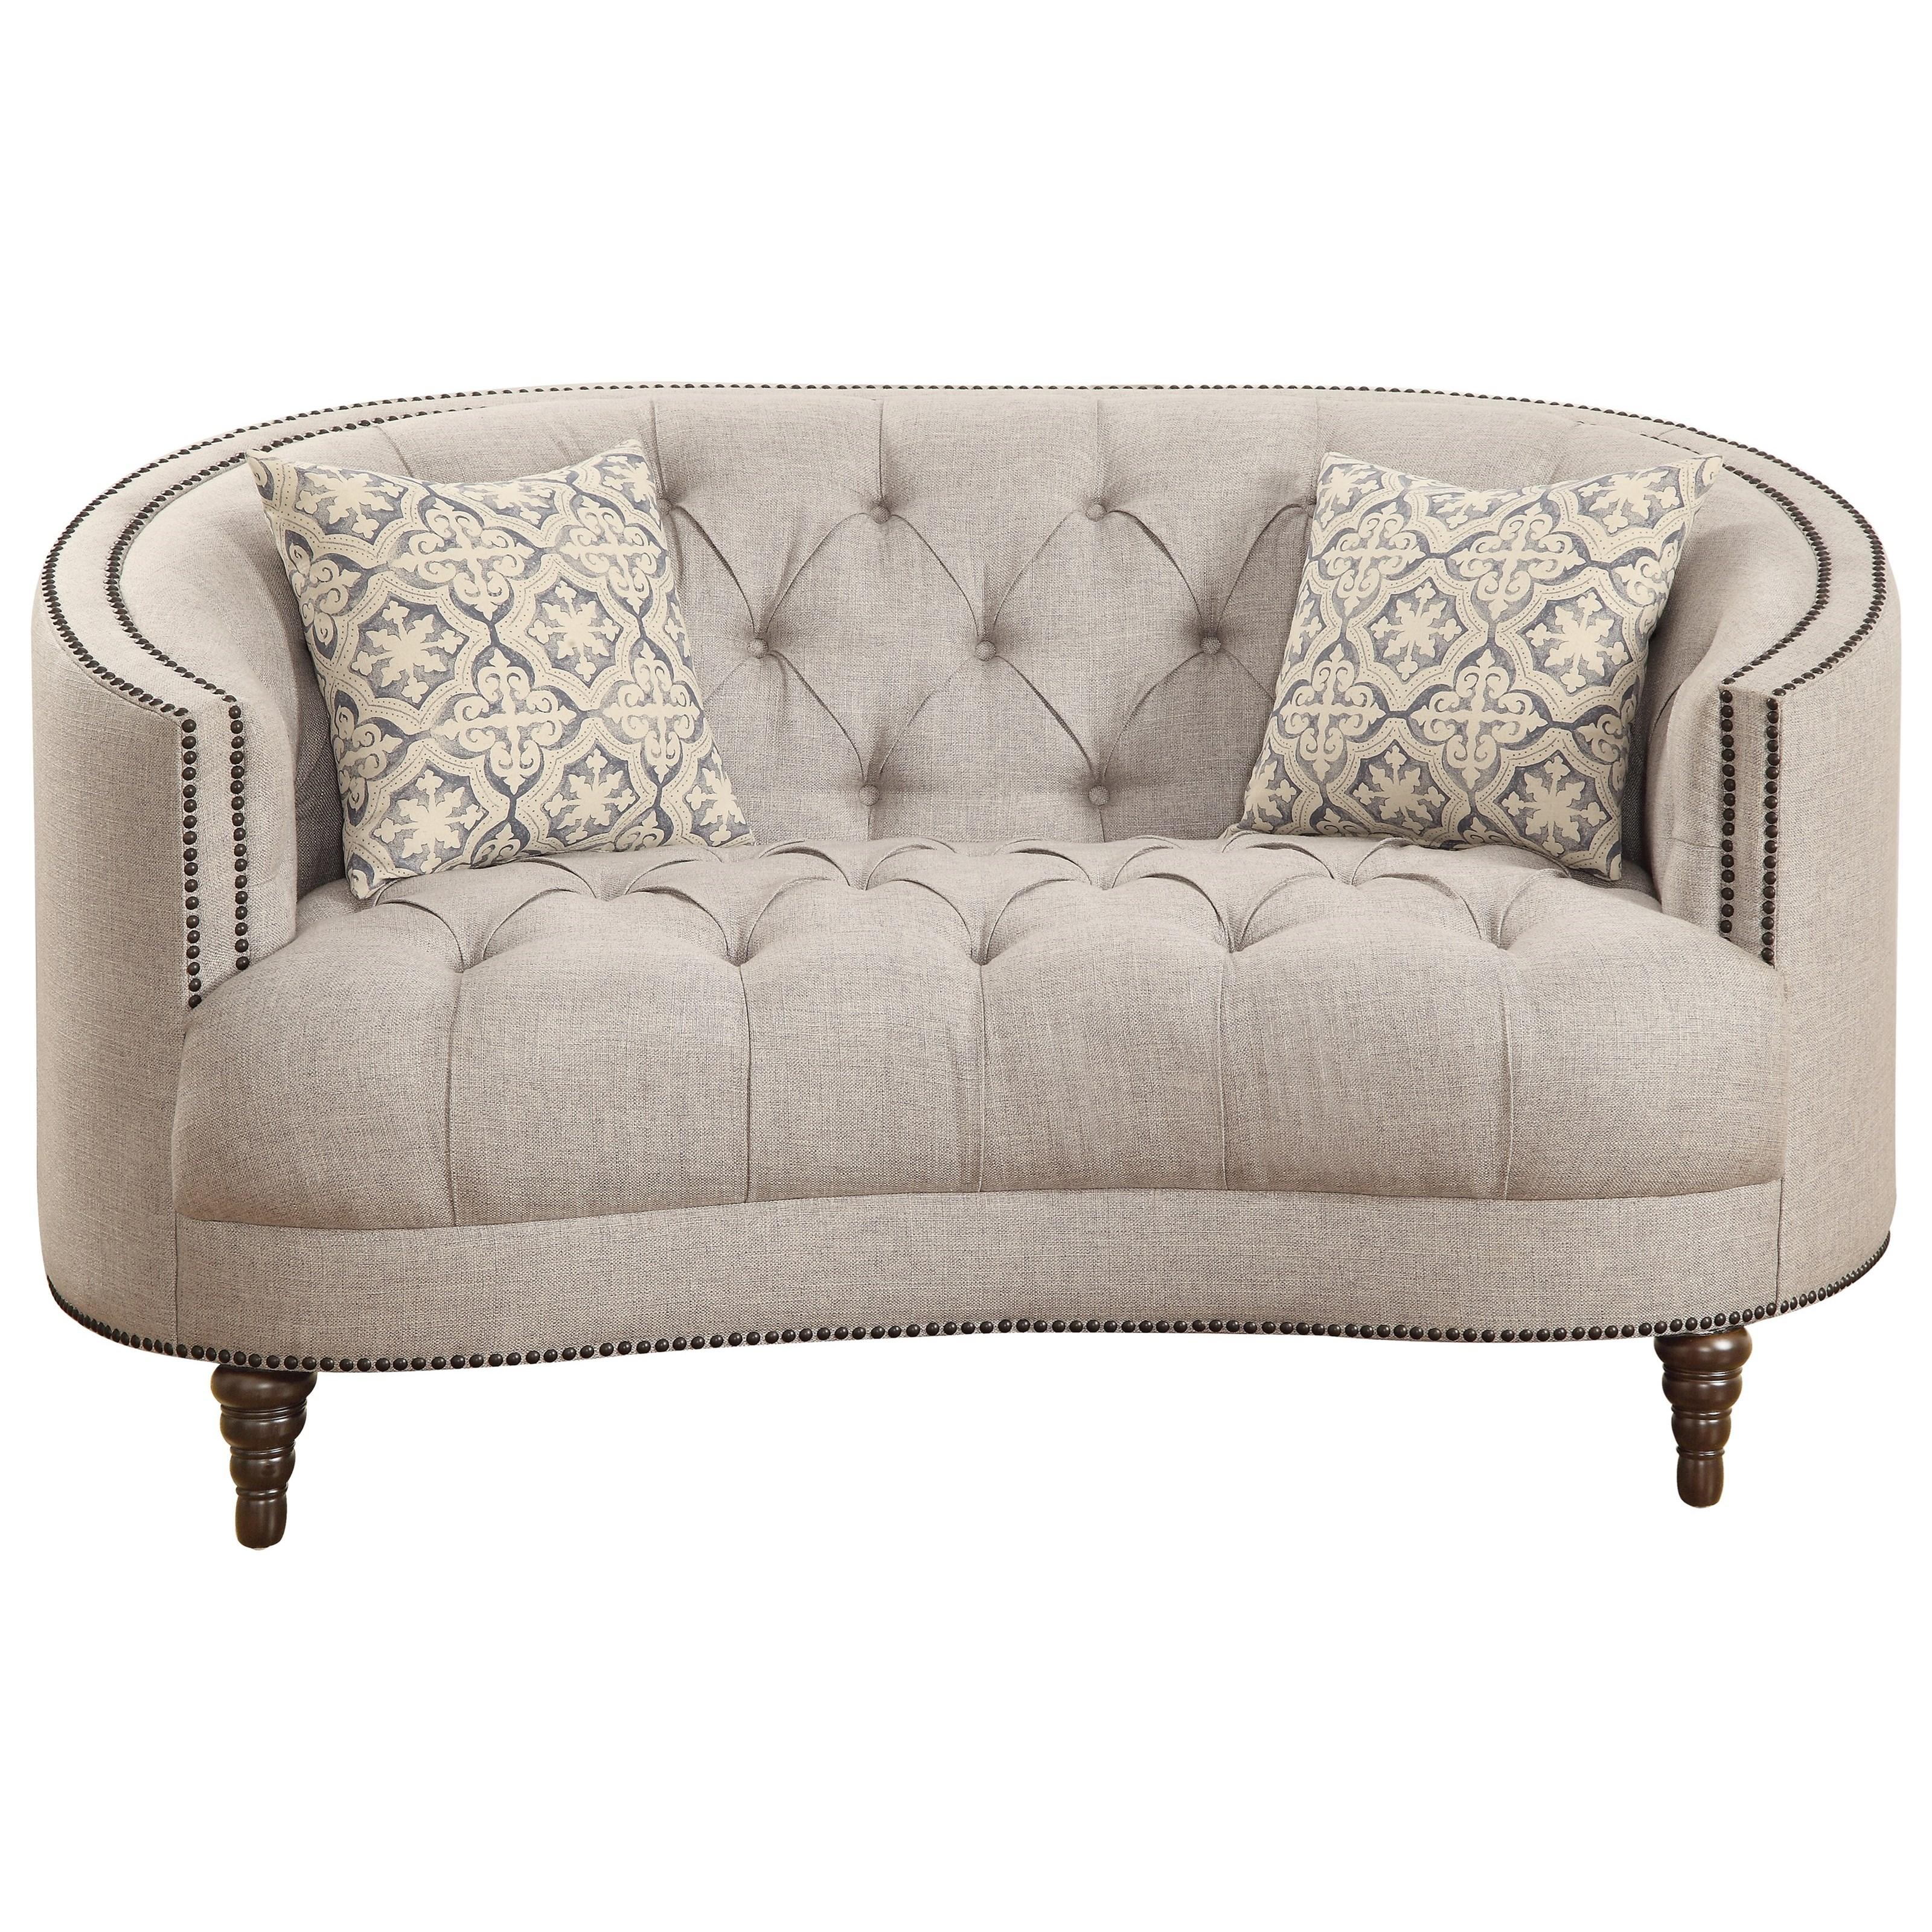 Avonlea Loveseat by Coaster at Standard Furniture